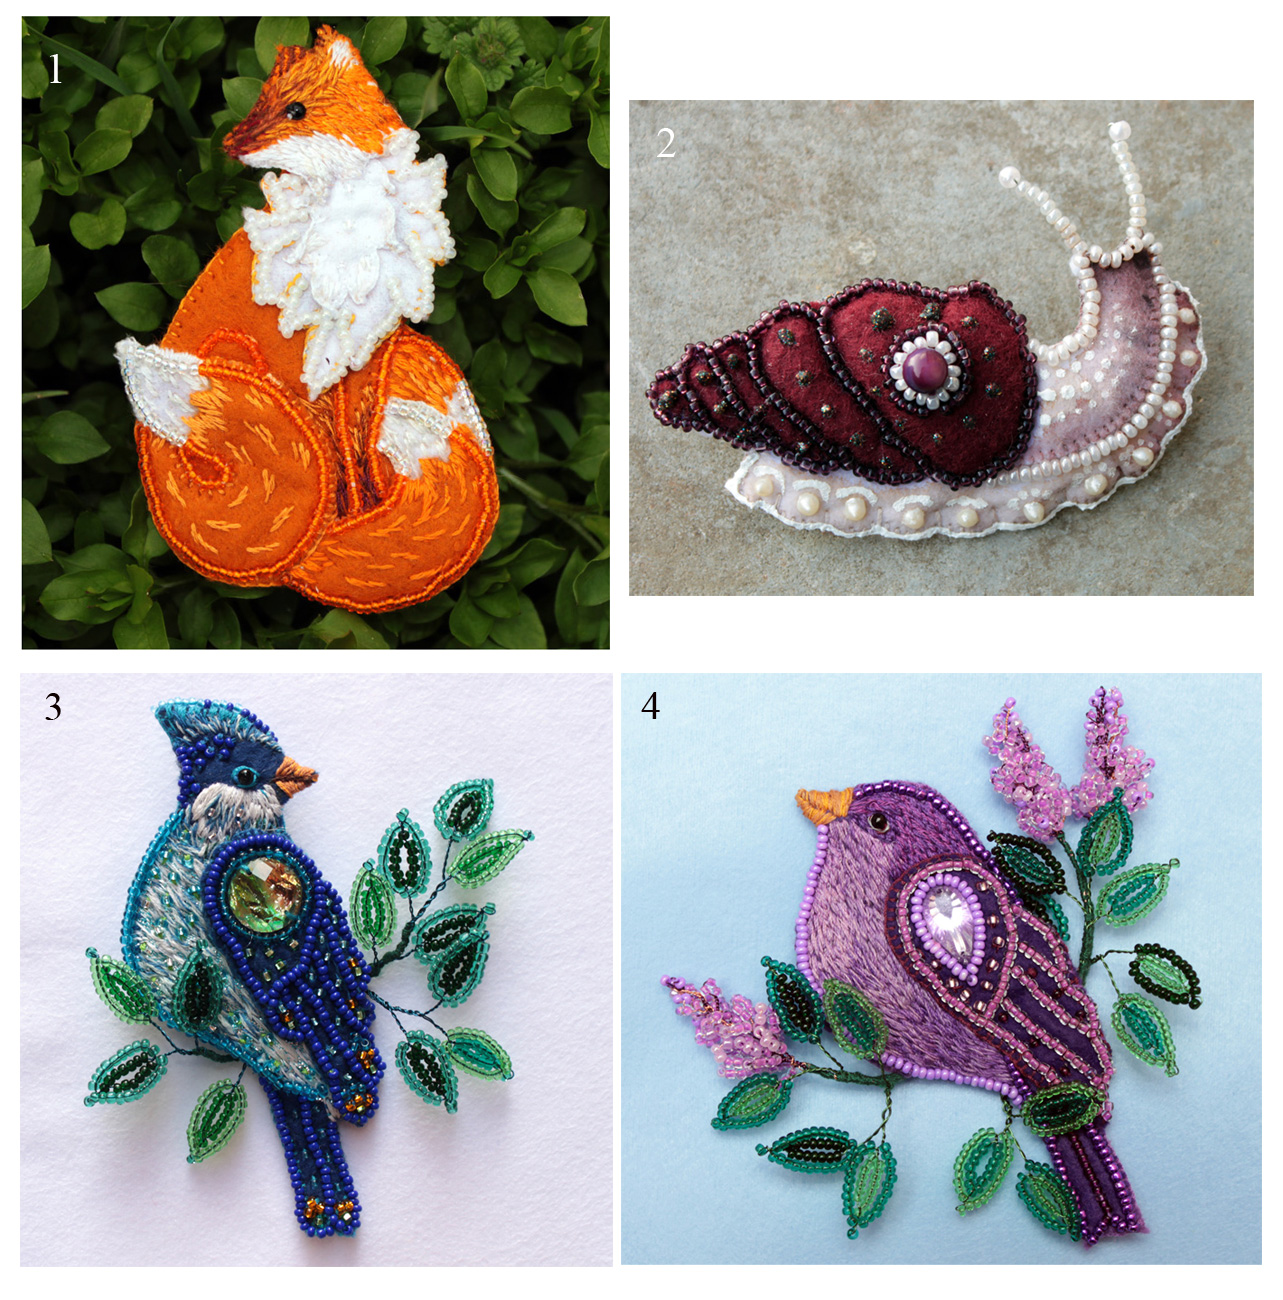 Felt brooches - kitsune, snail and birds by hontor